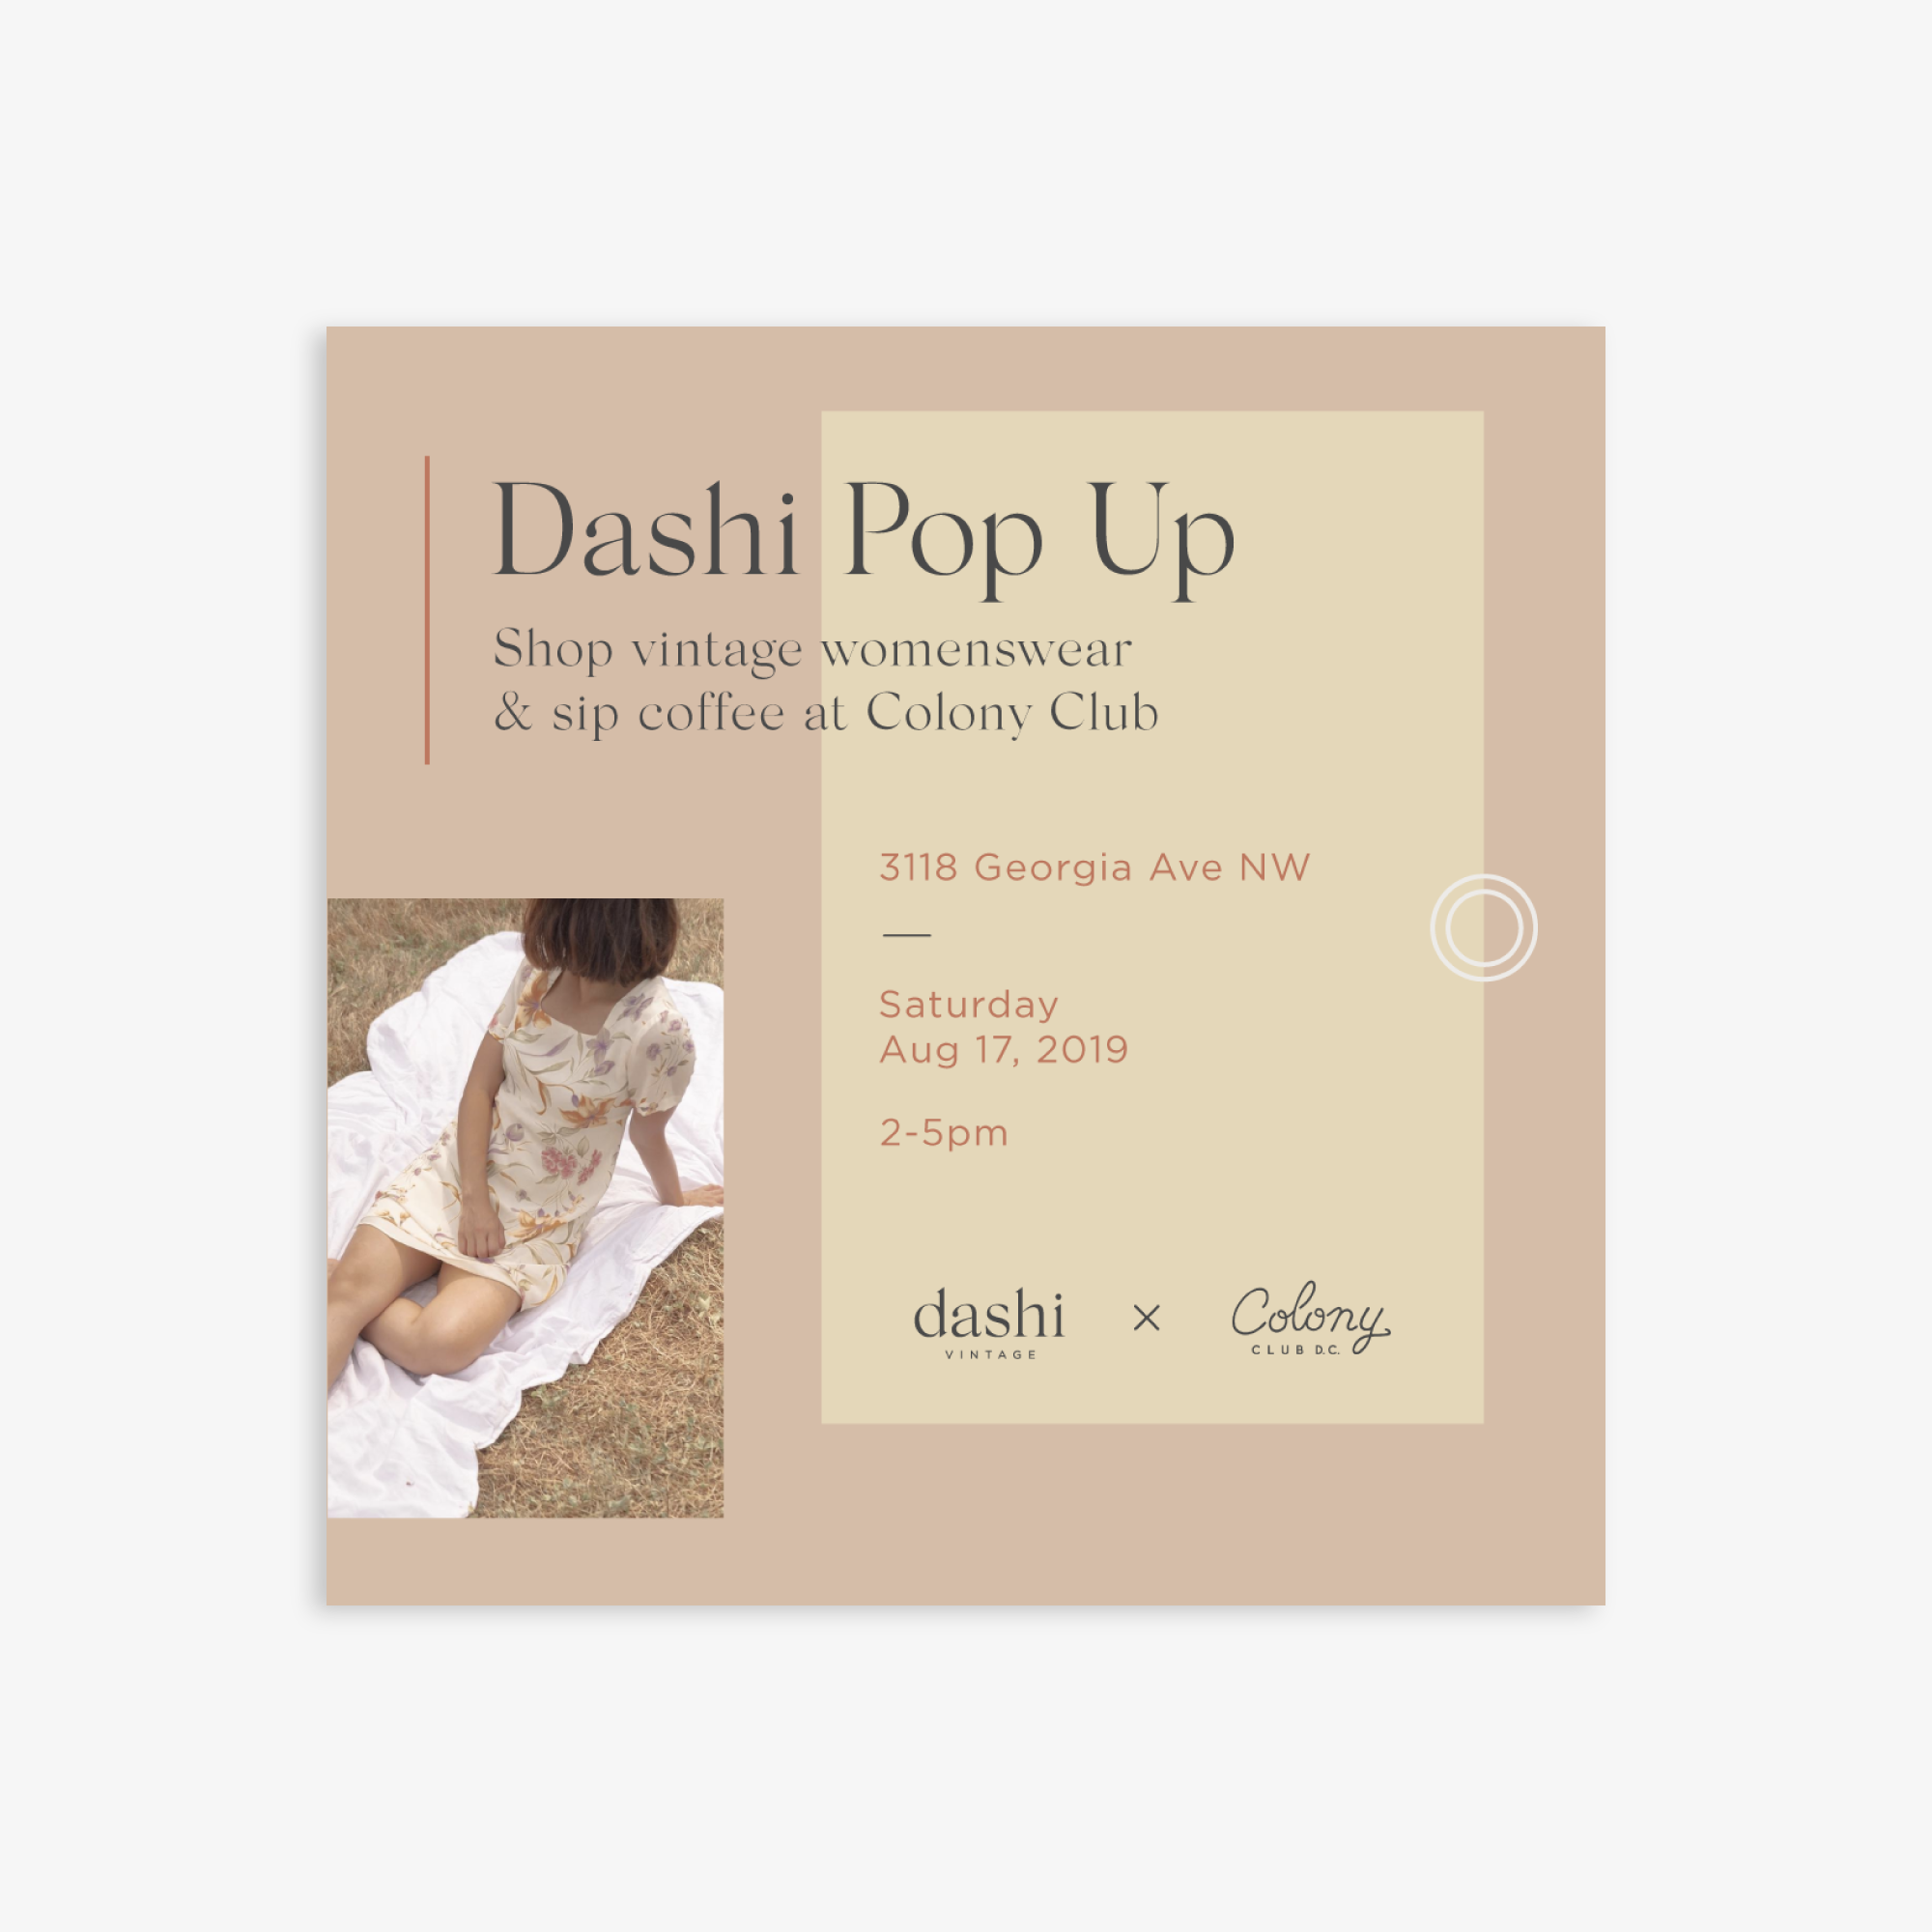 dashi-10.png